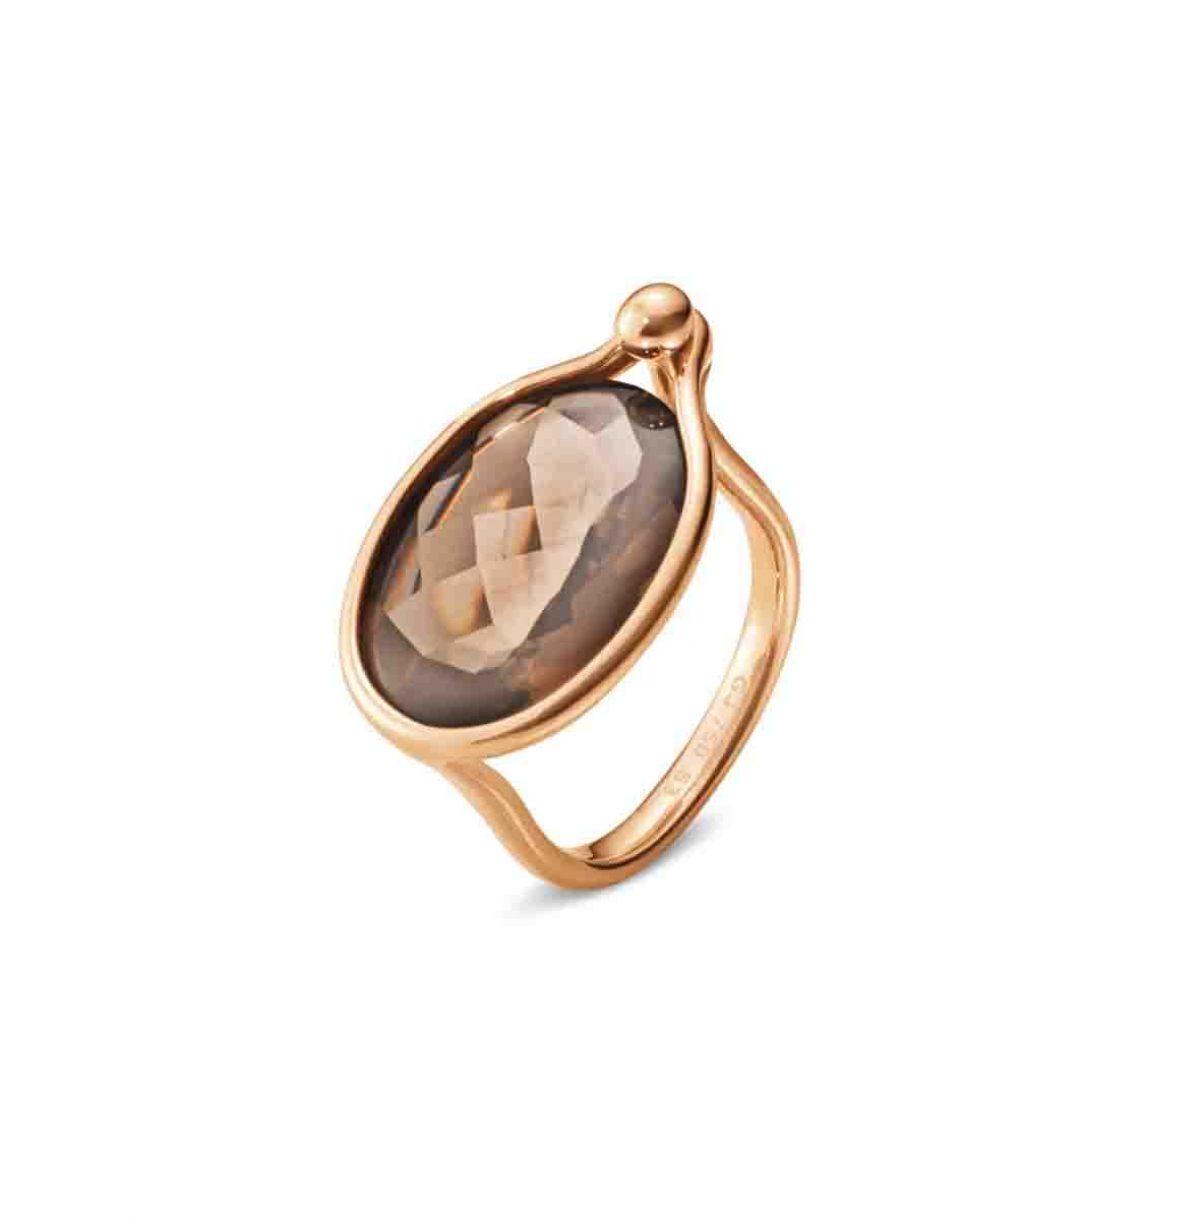 GEORG JENSEN SAVANNAH 18K玫瑰金煙水晶戒指,參考售價NTD 38,000起。